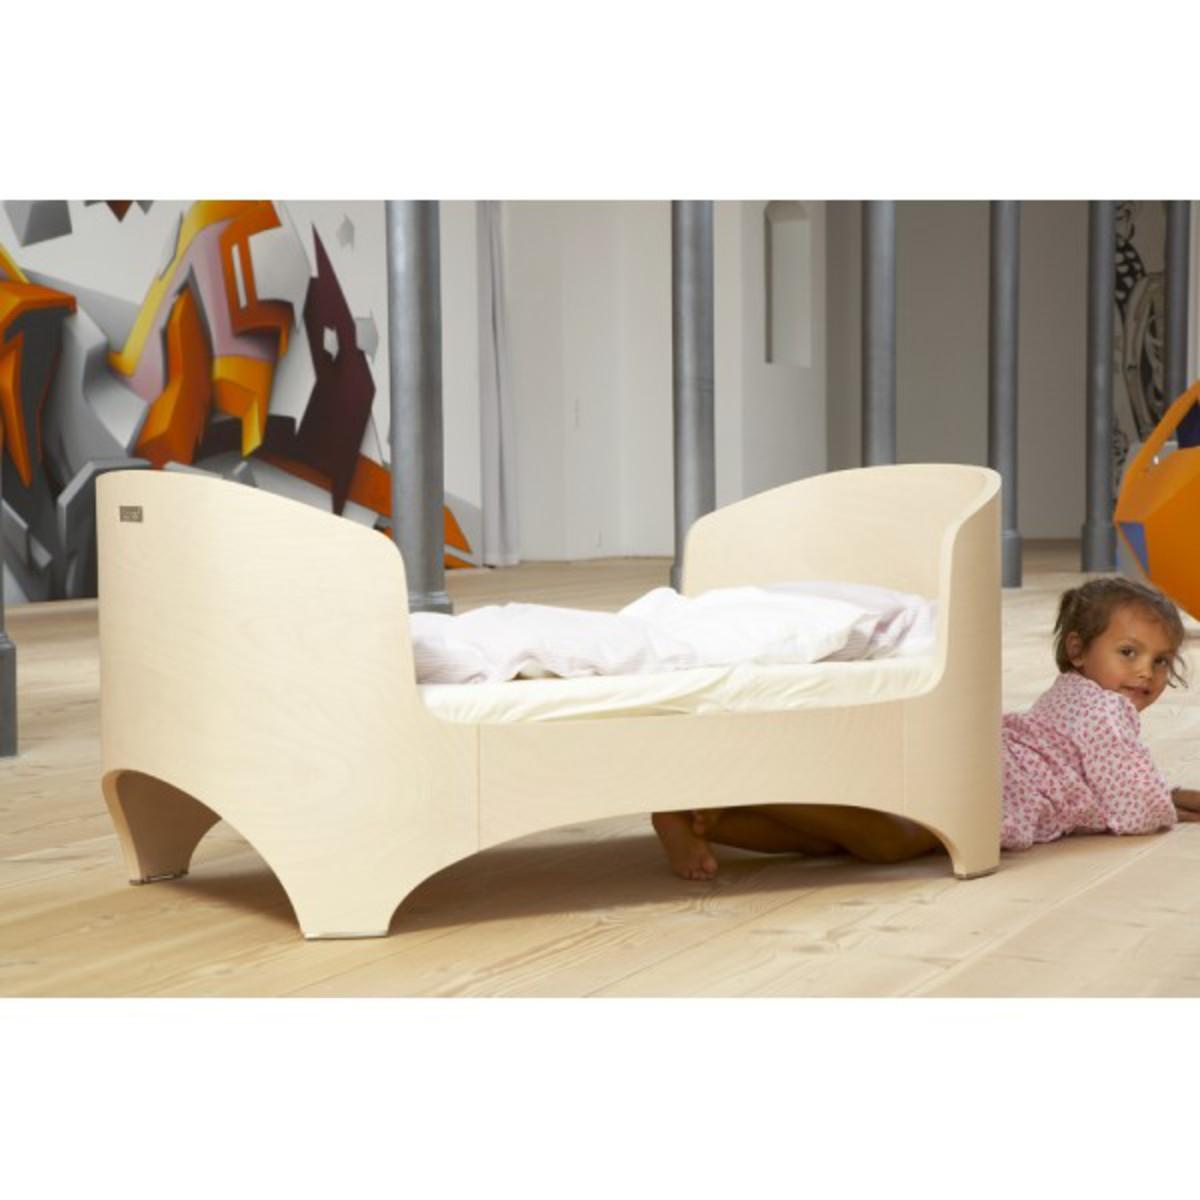 leander lit evolutif ceruse lit b b leander sur l 39 armoire de b b. Black Bedroom Furniture Sets. Home Design Ideas